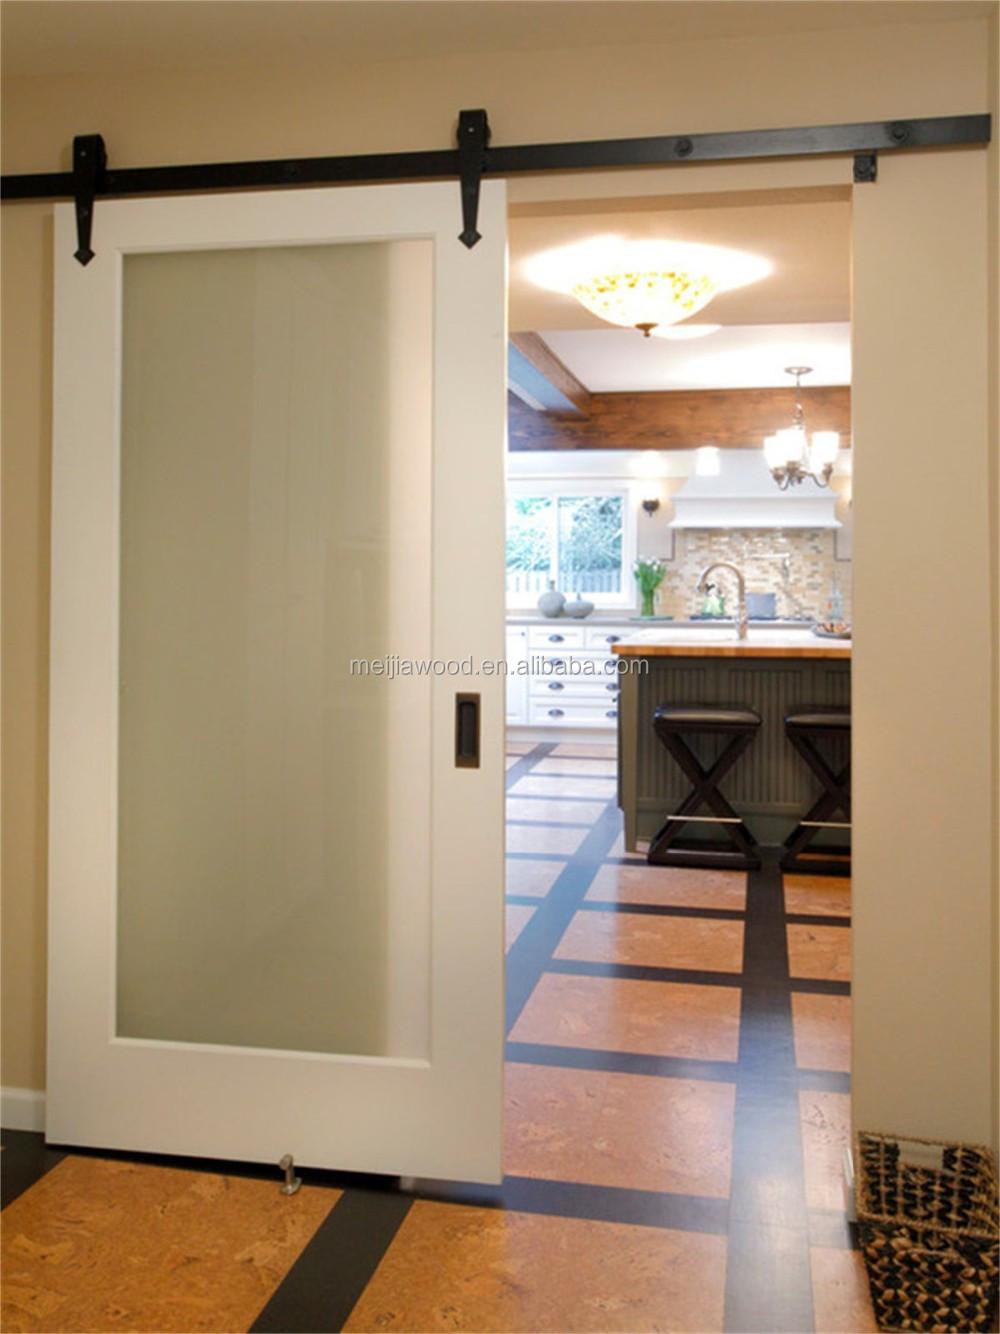 American Hotel Style Full Lite Interior Glazed Sliding Barn Door With Hardware